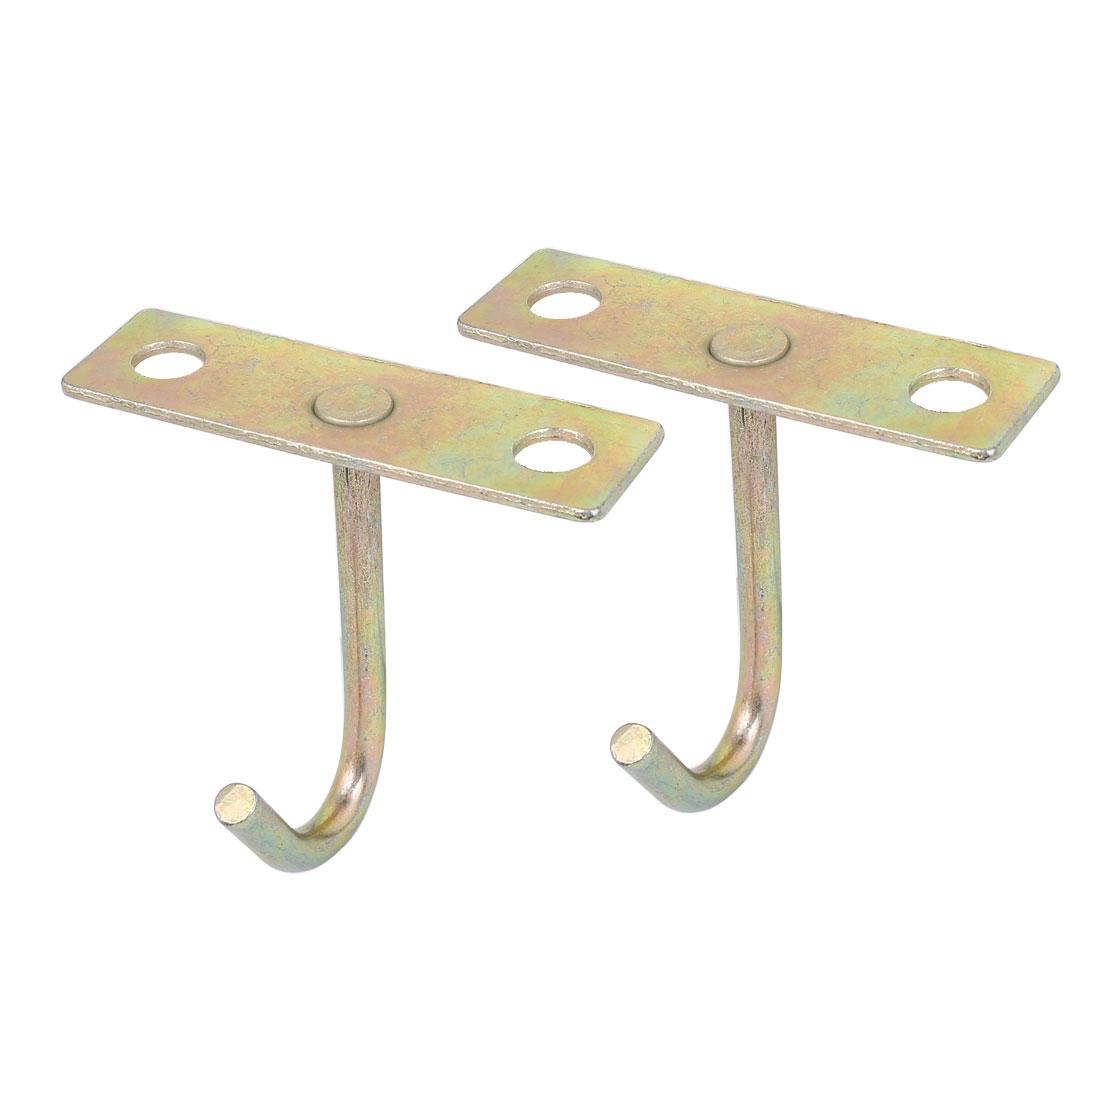 J Shaped Metal Ceiling Mount Hook Hanger 77mm Height Bronze Tone 2pcs